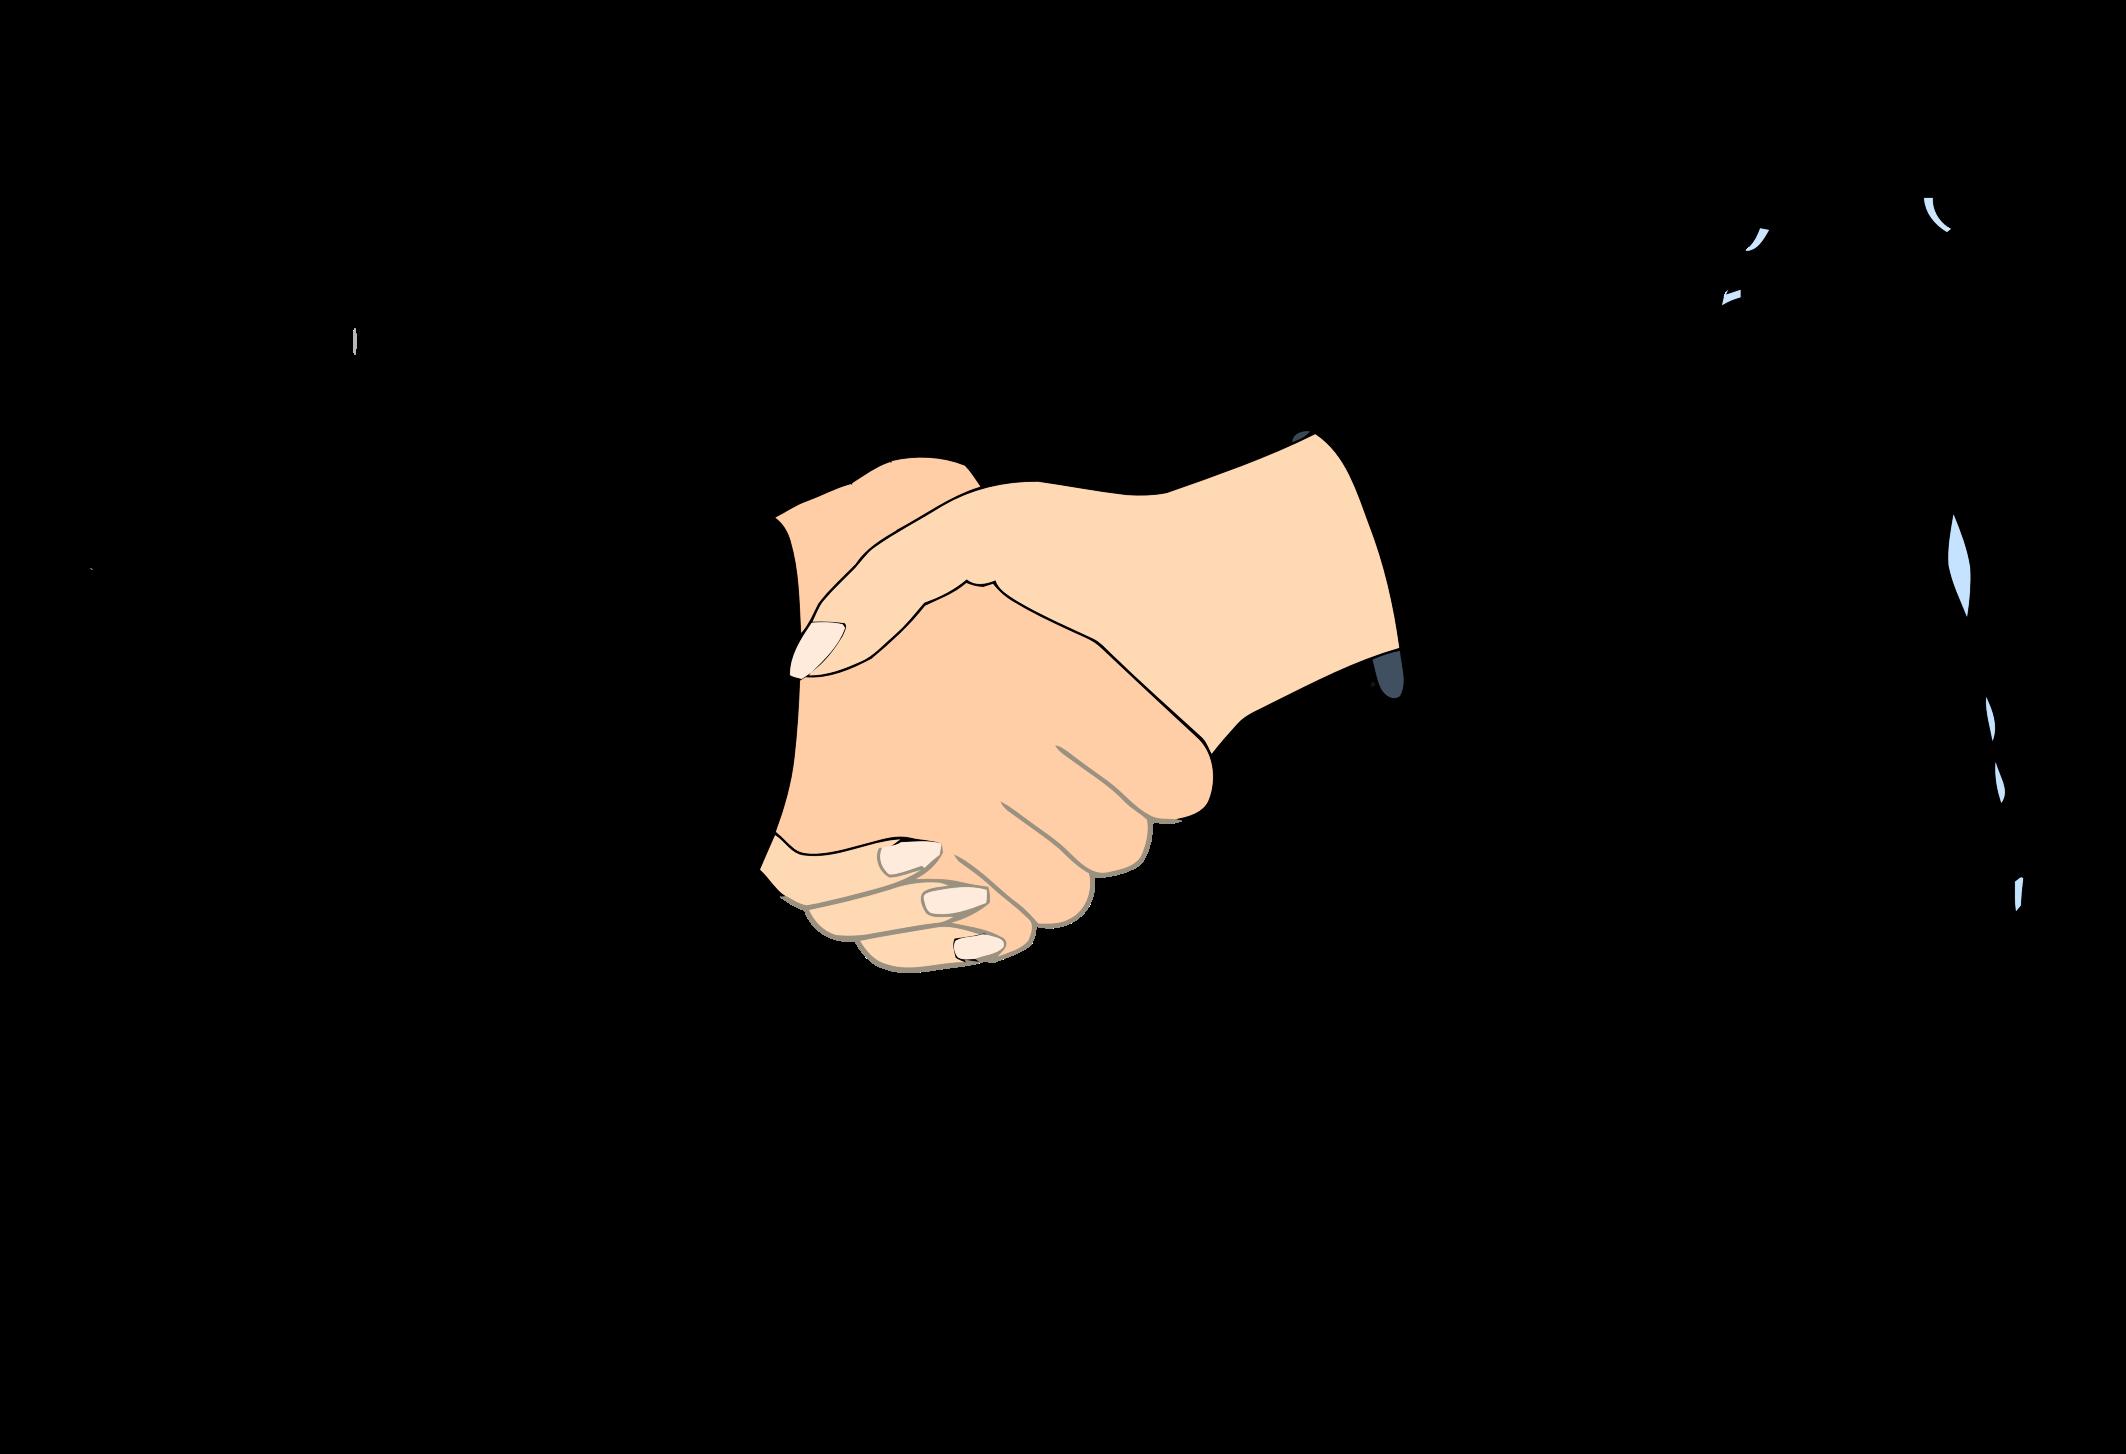 Big image png. Handshake clipart business customer